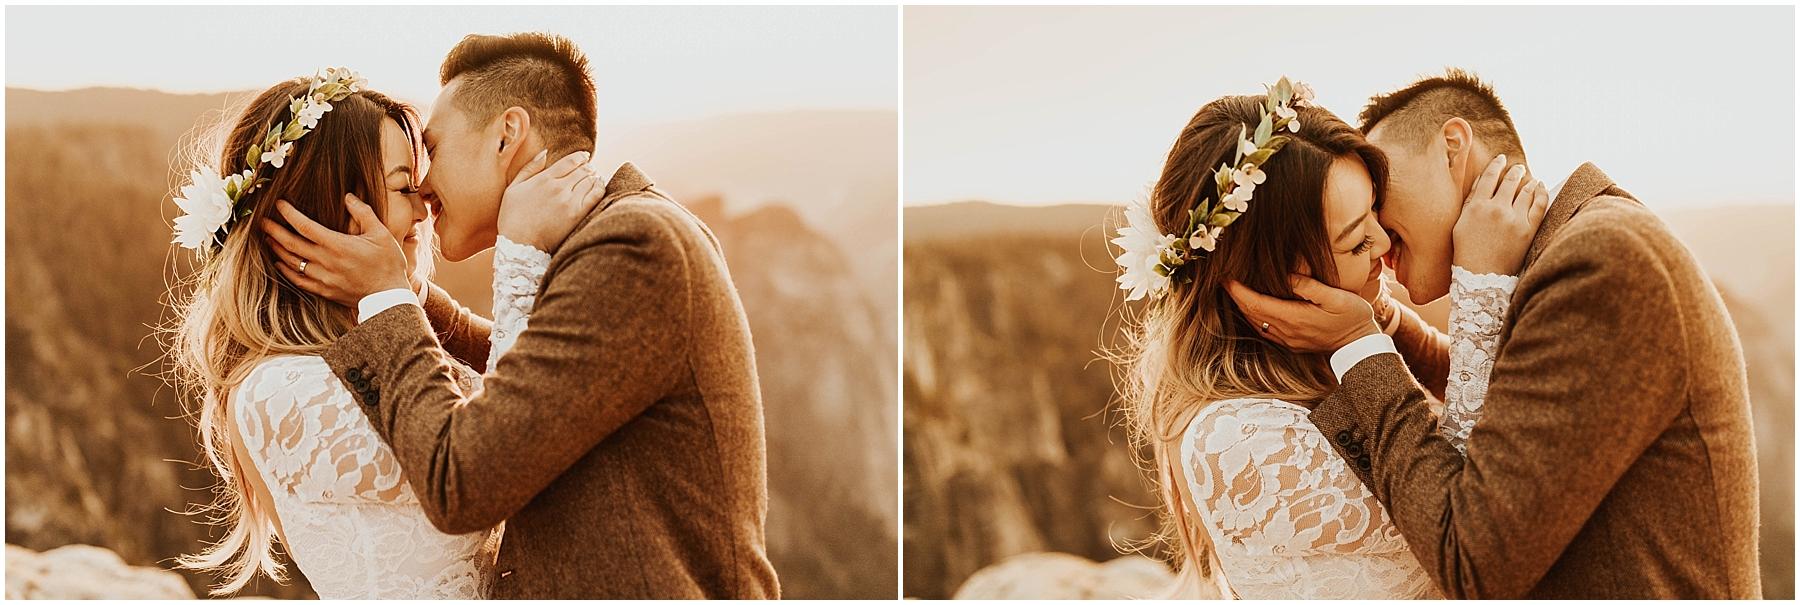 Yosemite_elopement_0113.jpg